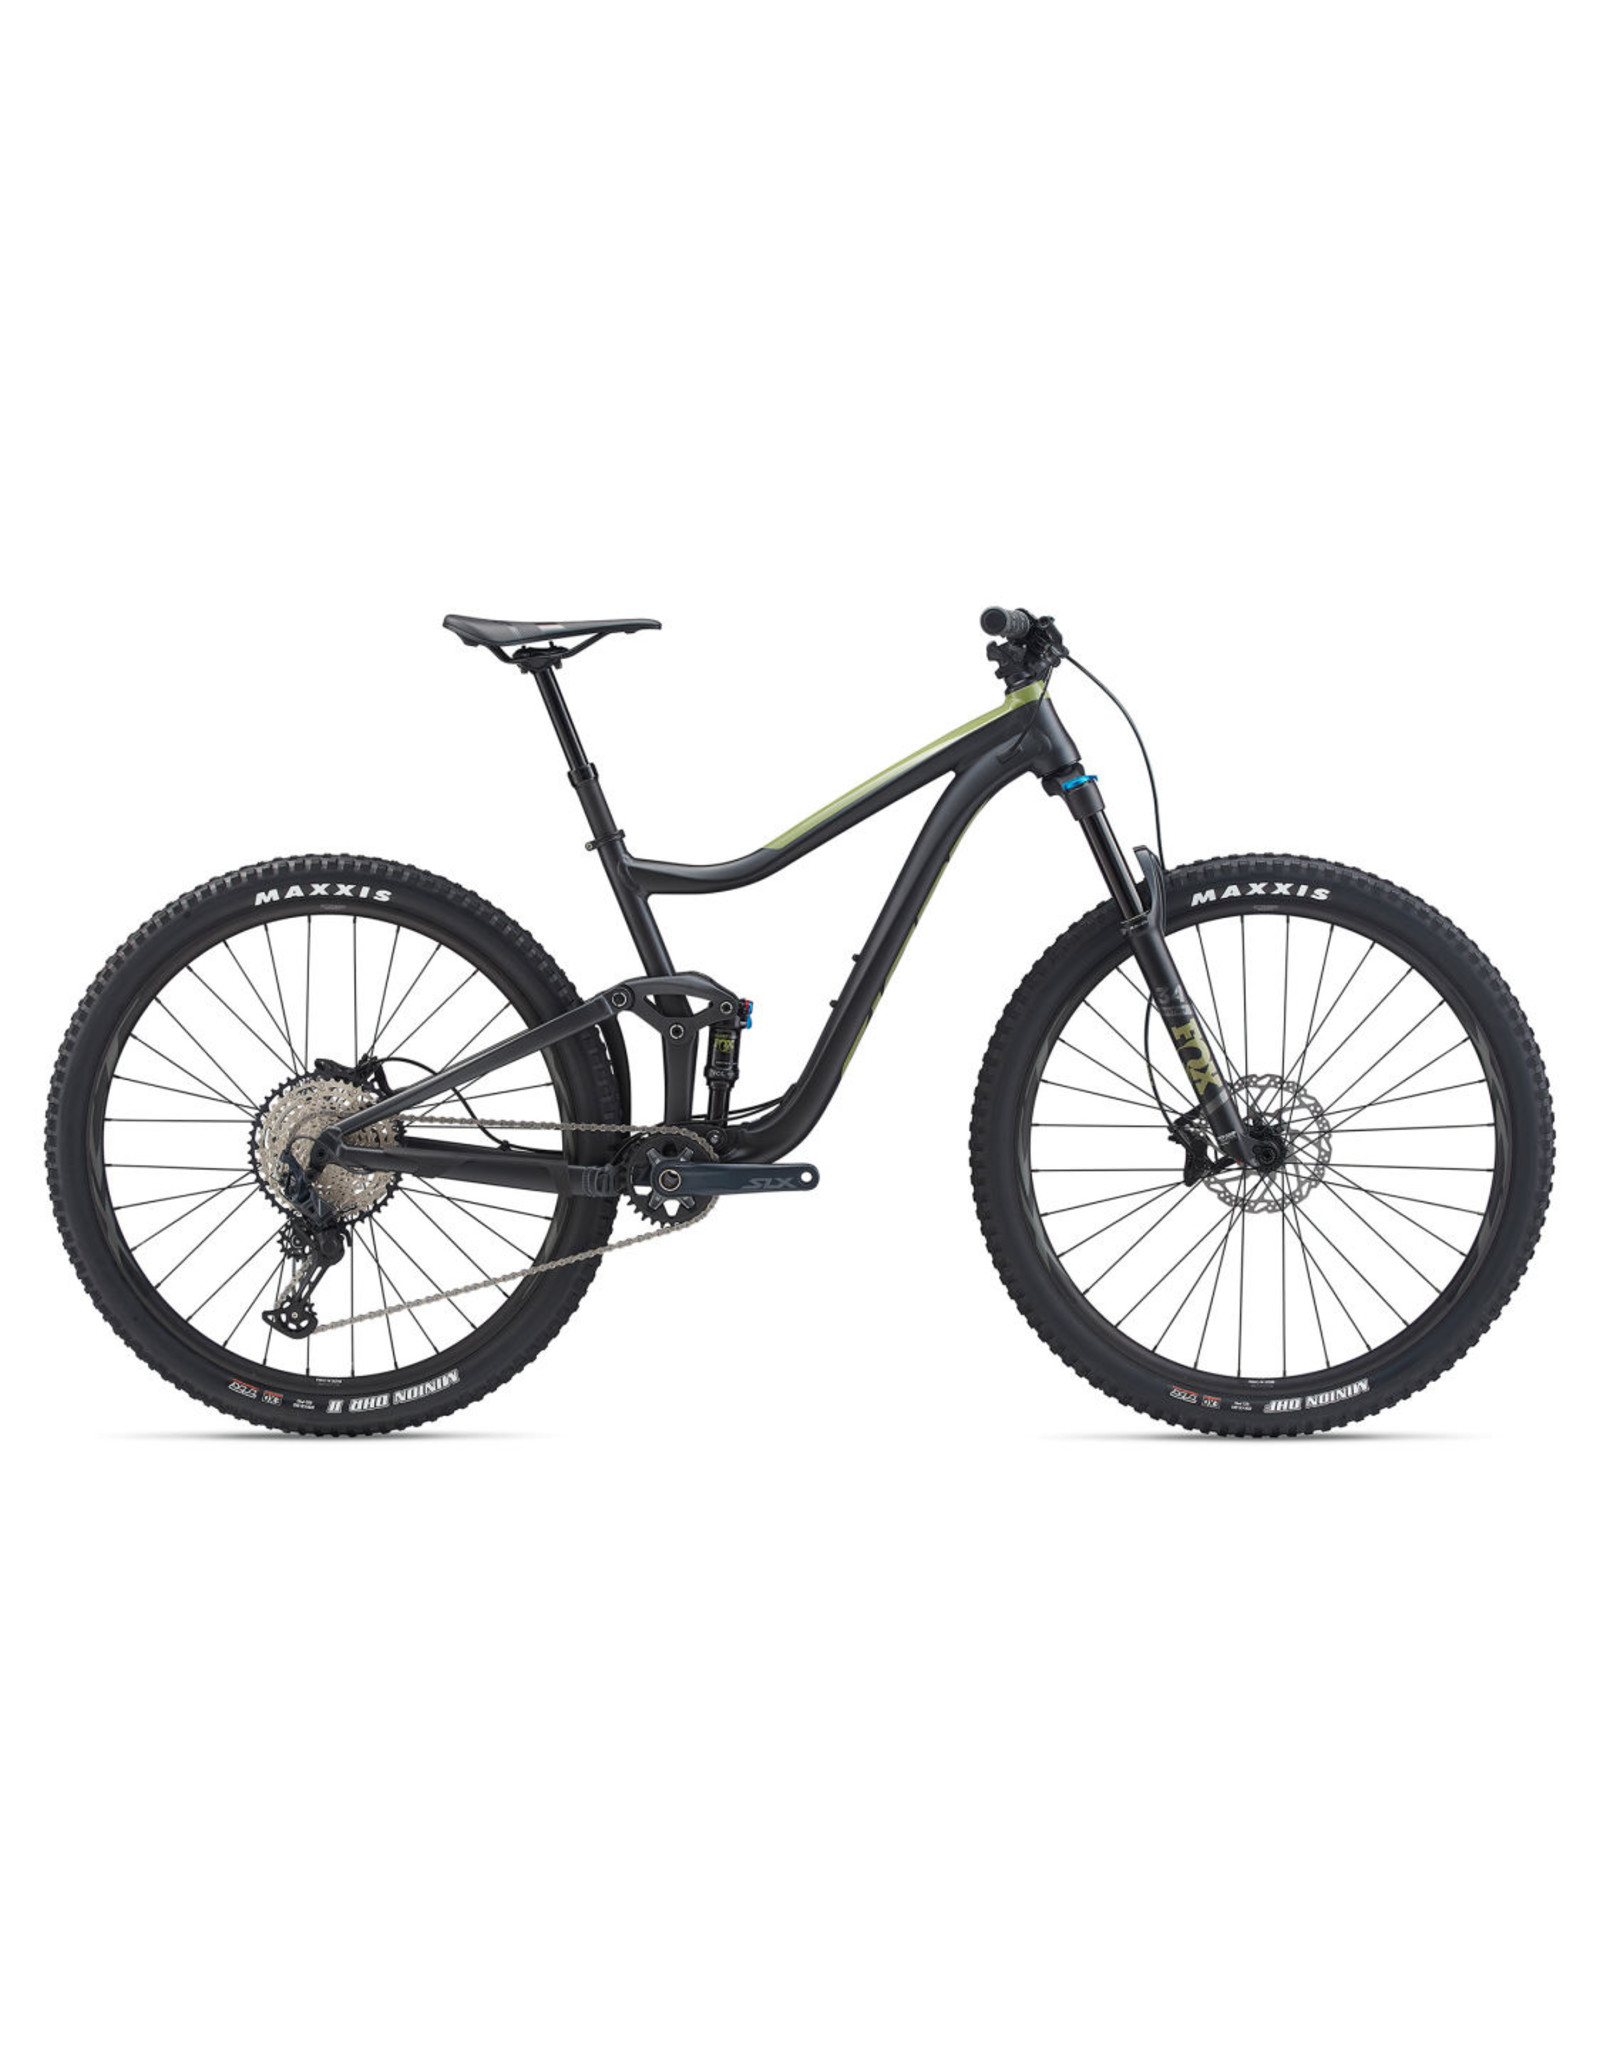 GIANT BICYCLES 2020 Trance 29 2 Gunmetal